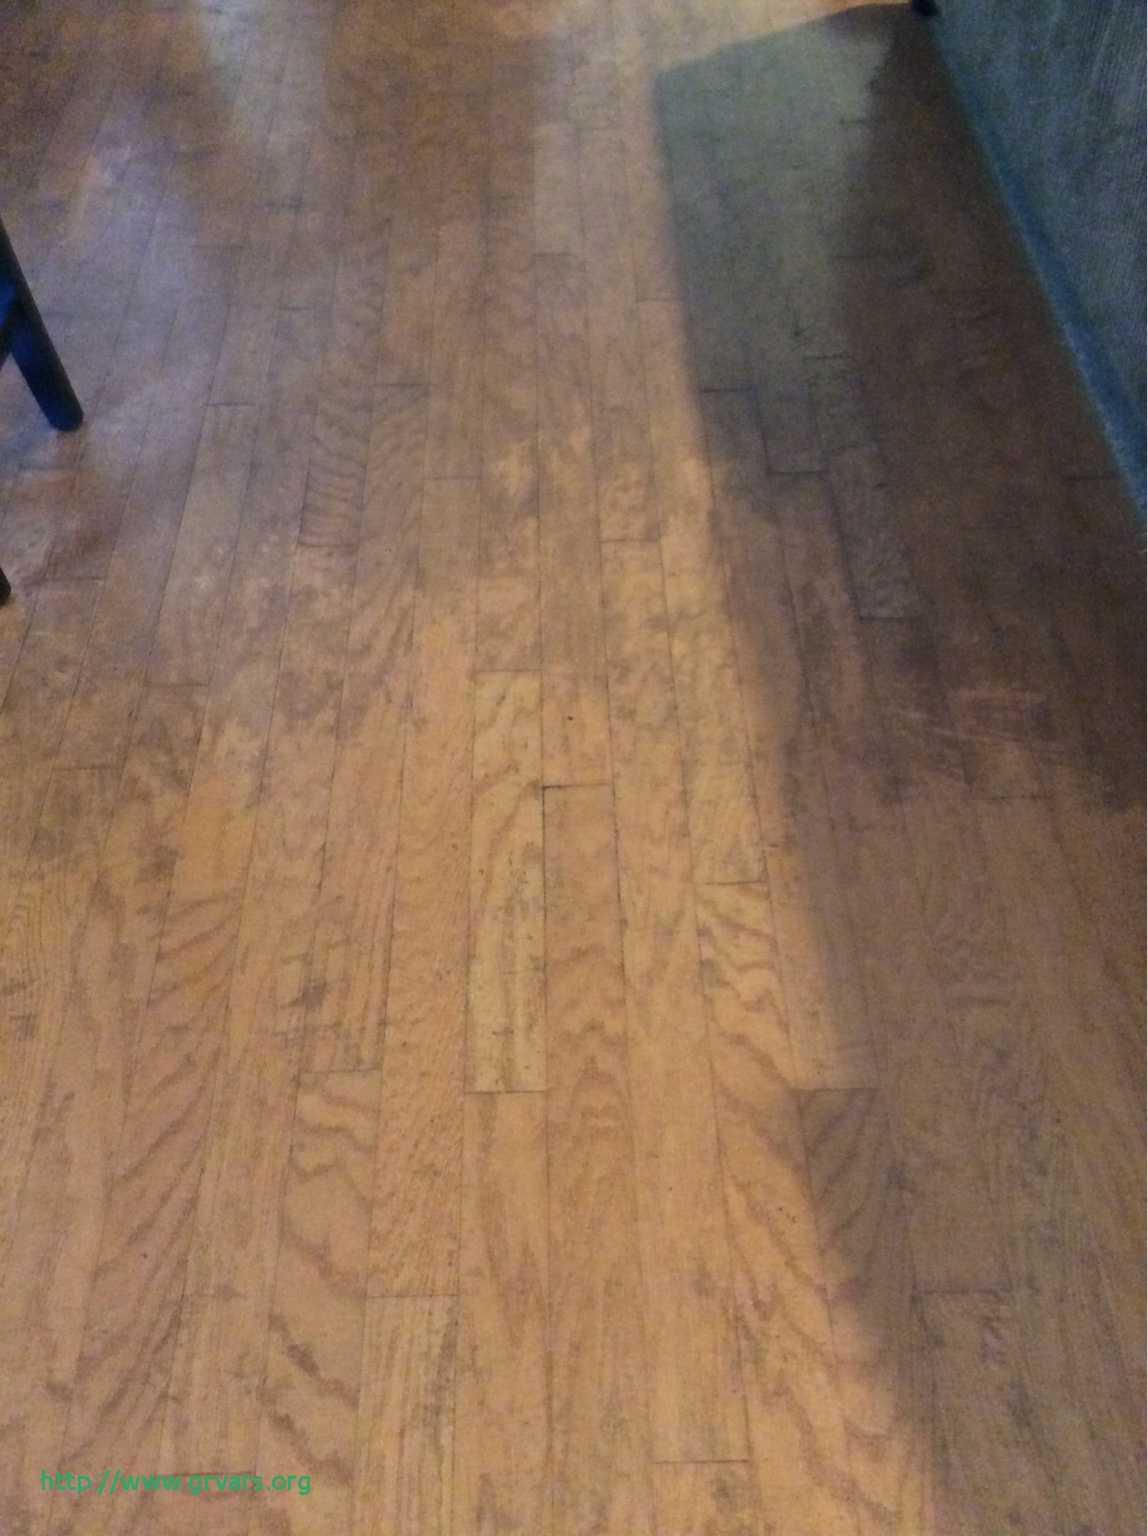 hardwood floor in bathroom smells like urine of remove pet urine odor from hardwood floors a‰lagant 68 best best air throughout remove pet urine odor from hardwood floors inspirant hardwood floor cleaning help